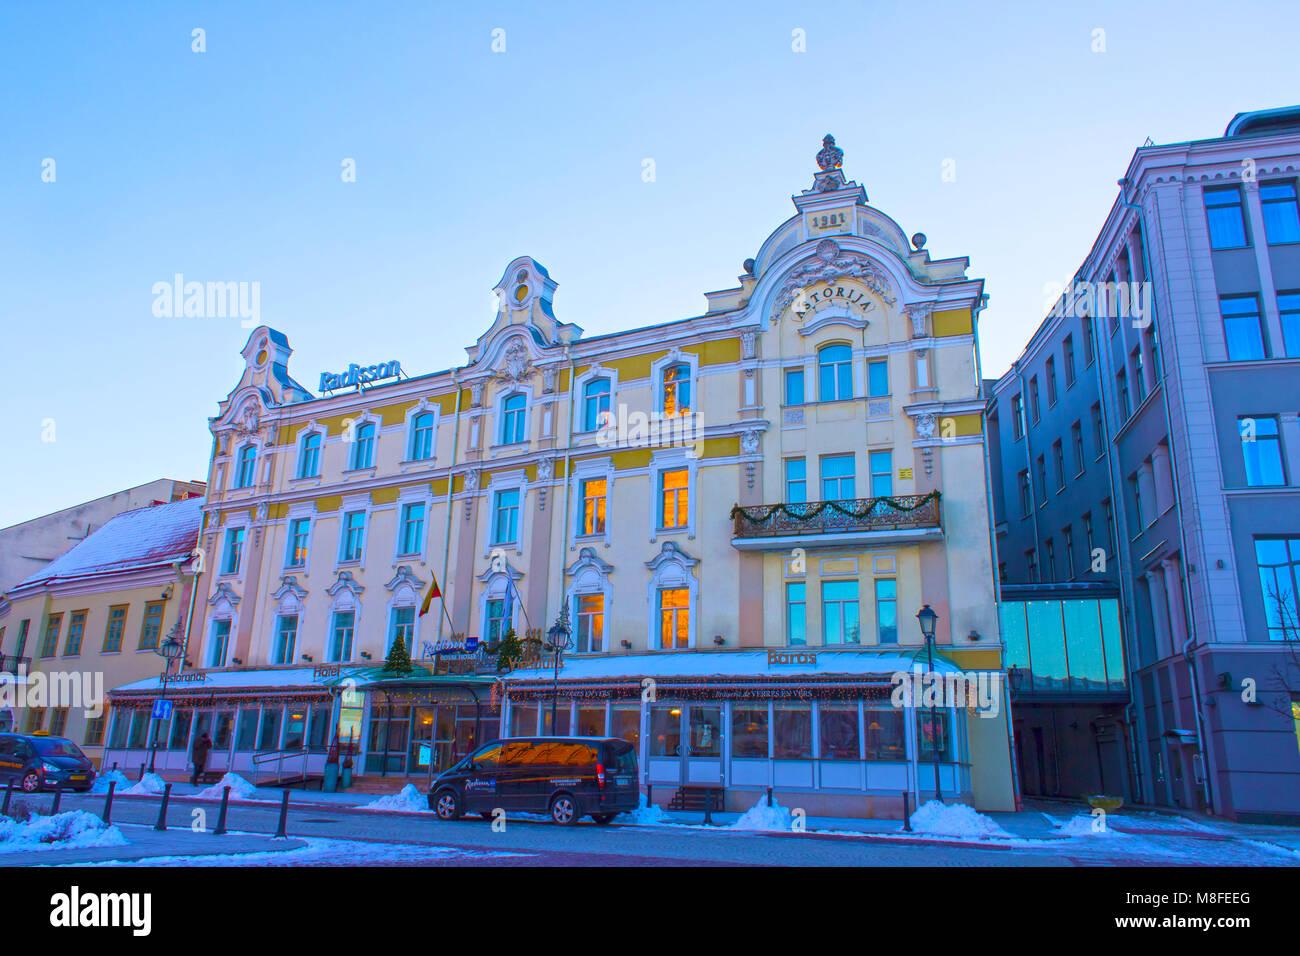 VIlnius, Lithuania - January 05, 2017: The Astorija Hotel in Vilnius, Lithuania. Radisson Blu Hotels Resorts, part - Stock Image